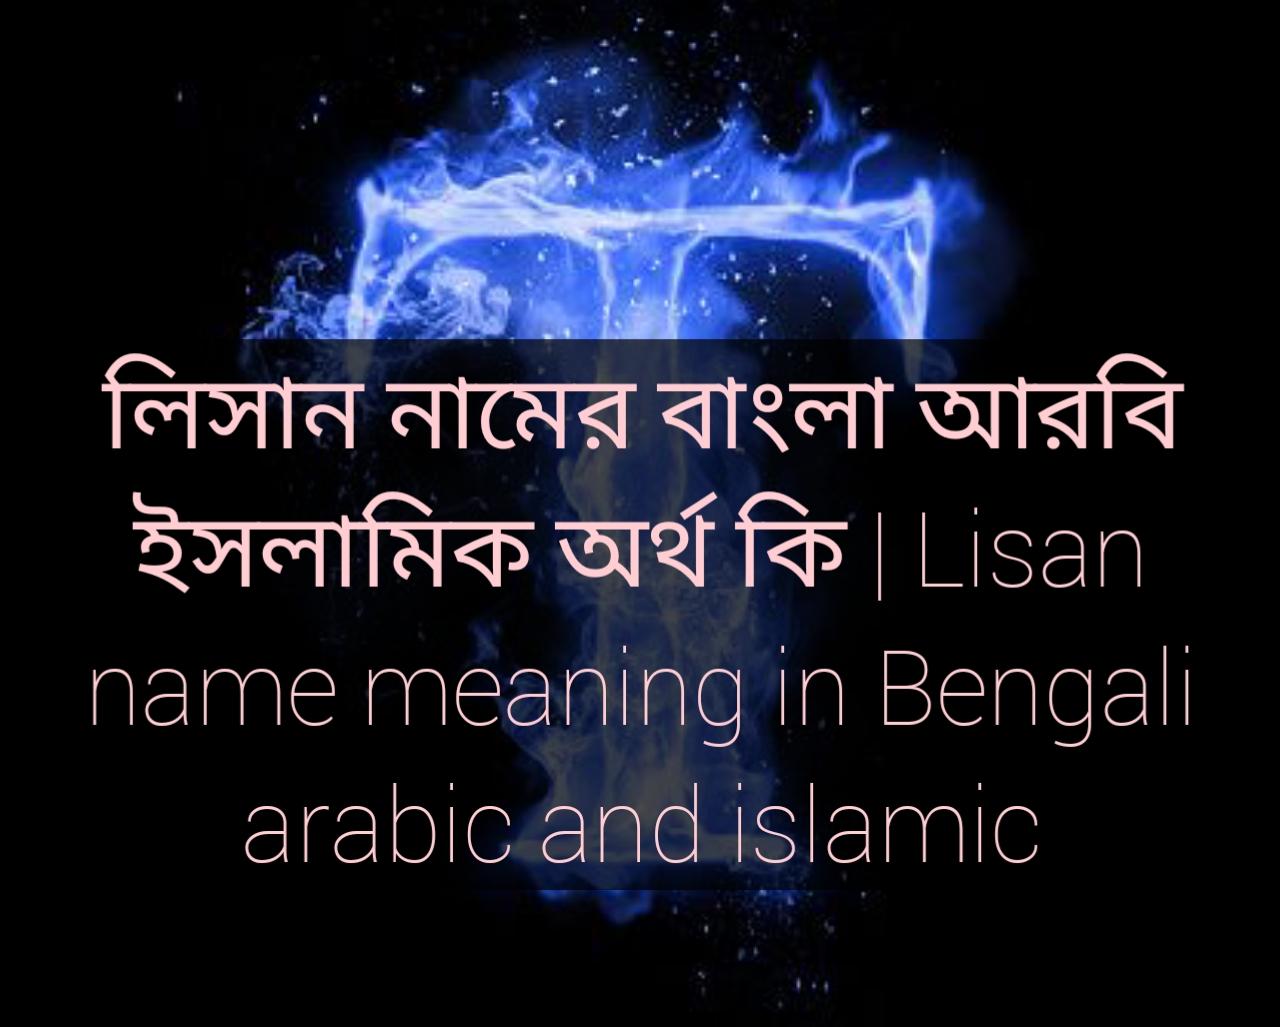 Lisan name meaning in Bengali, লিসান নামের অর্থ কি, লিসান নামের বাংলা অর্থ কি, লিসান নামের ইসলামিক অর্থ কি,